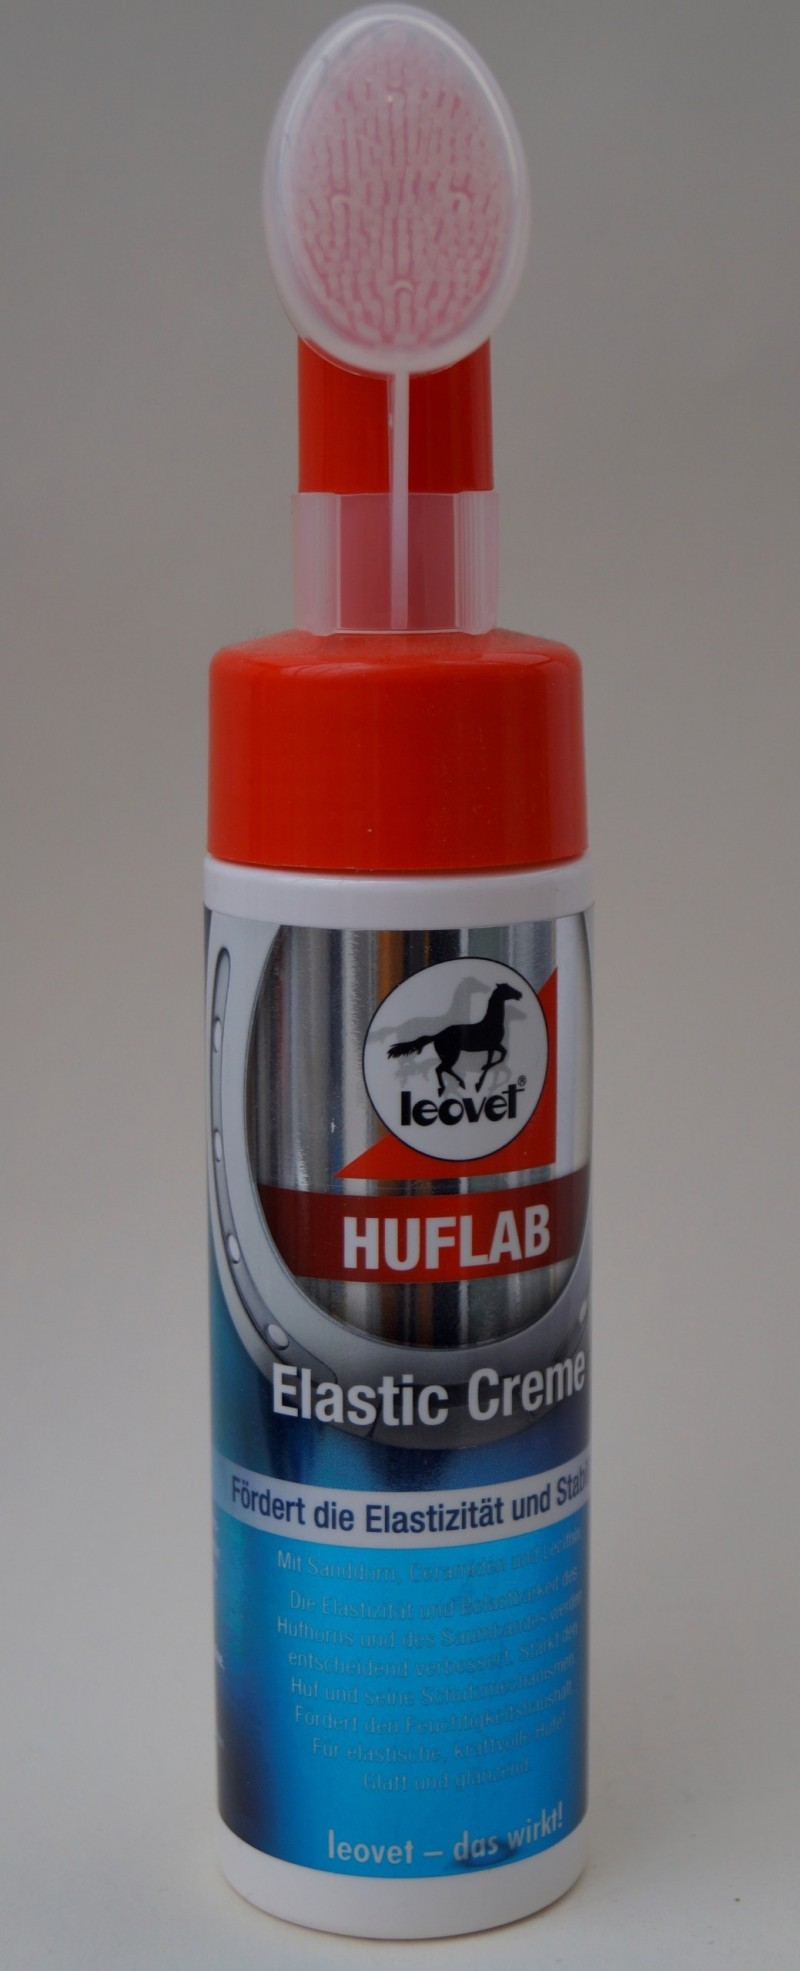 Leovet Huflab - Elastic Creme 1